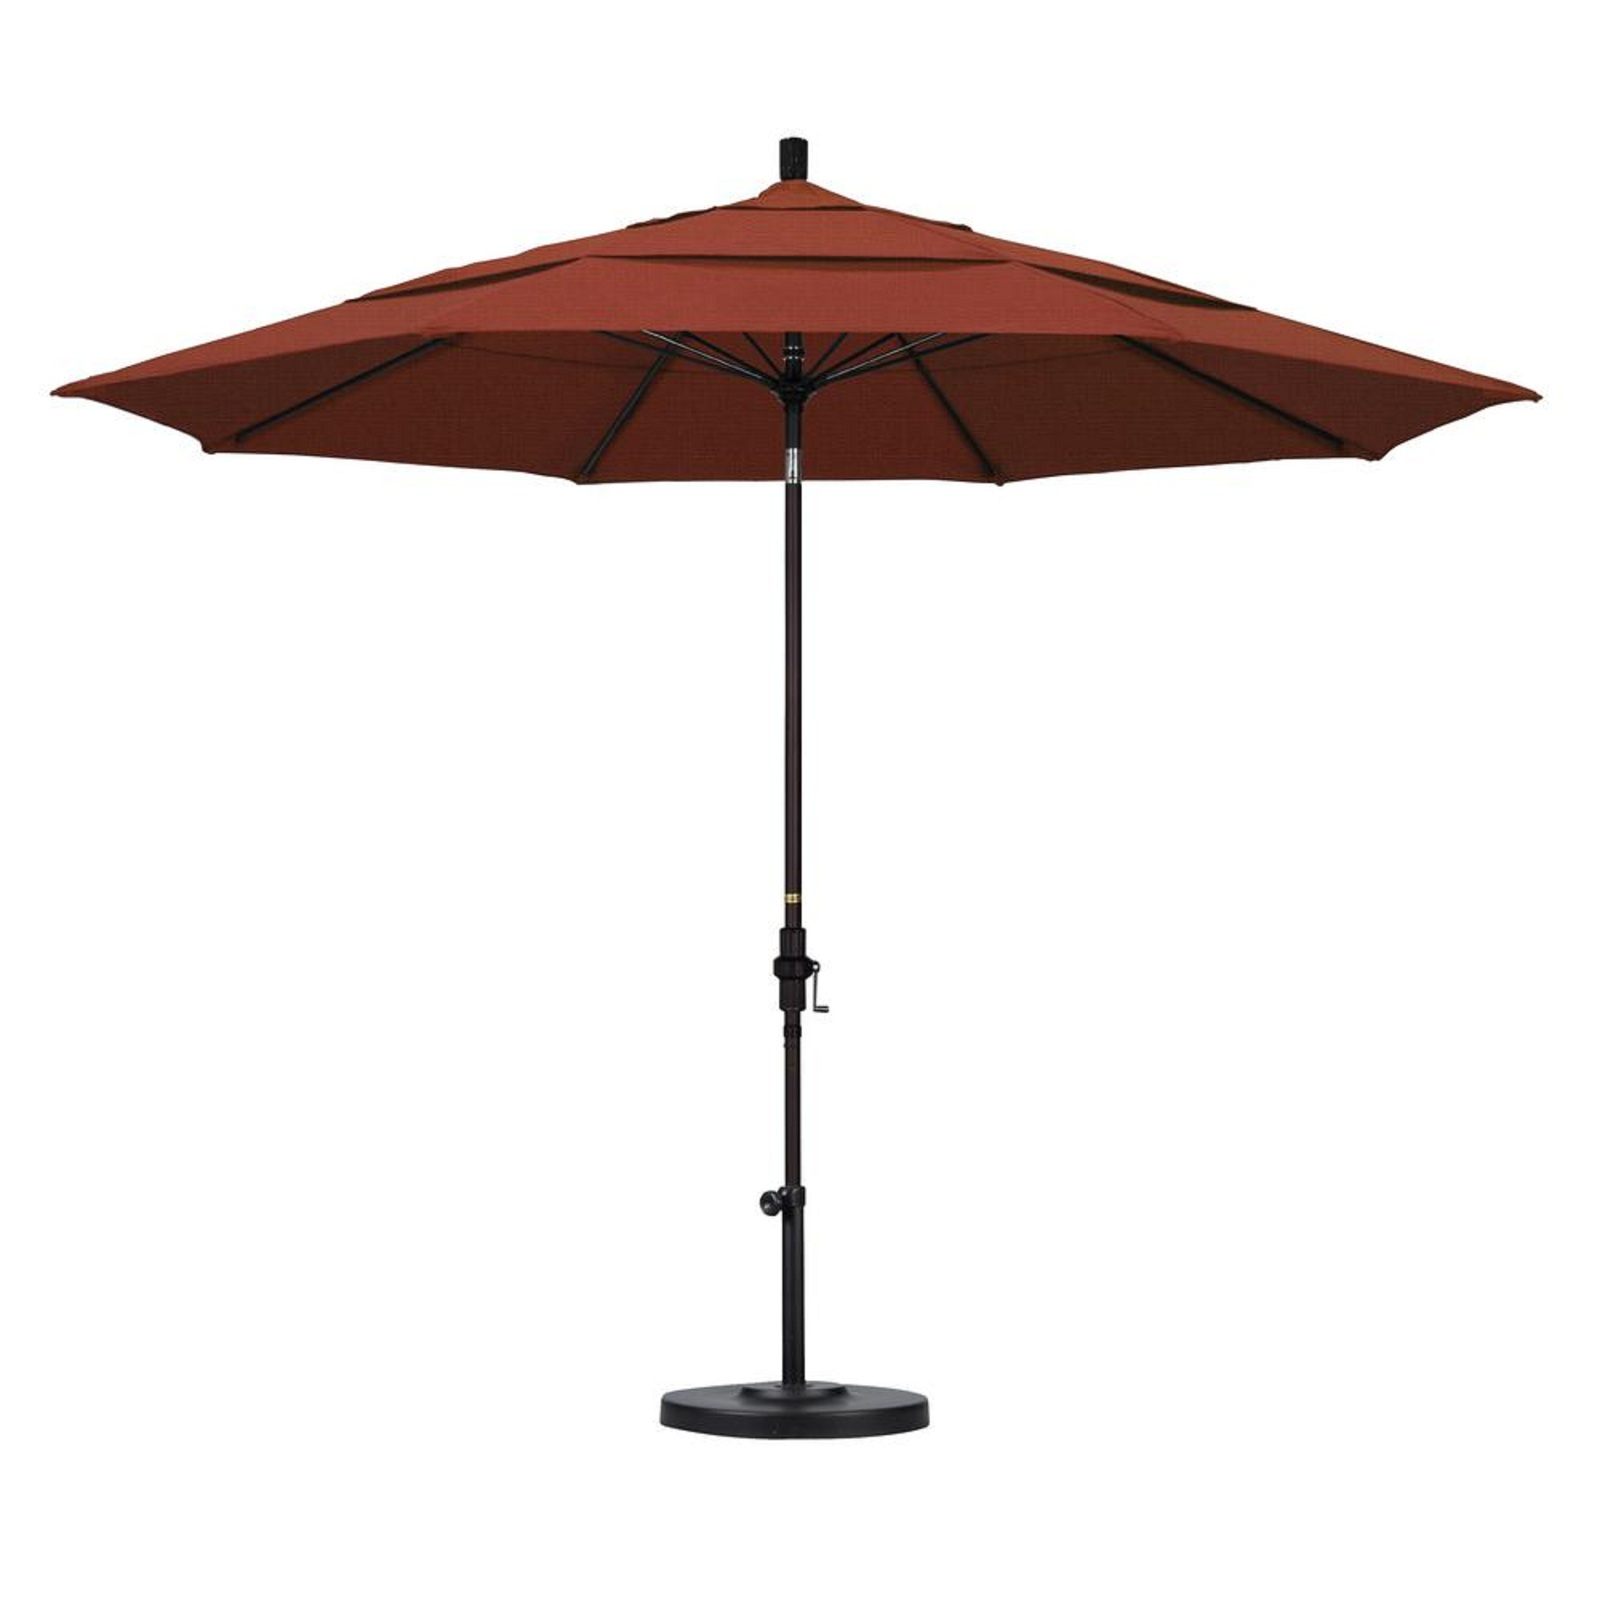 California umbrella market umbrellas gscuf118117 f69 dwv 64 1000  1